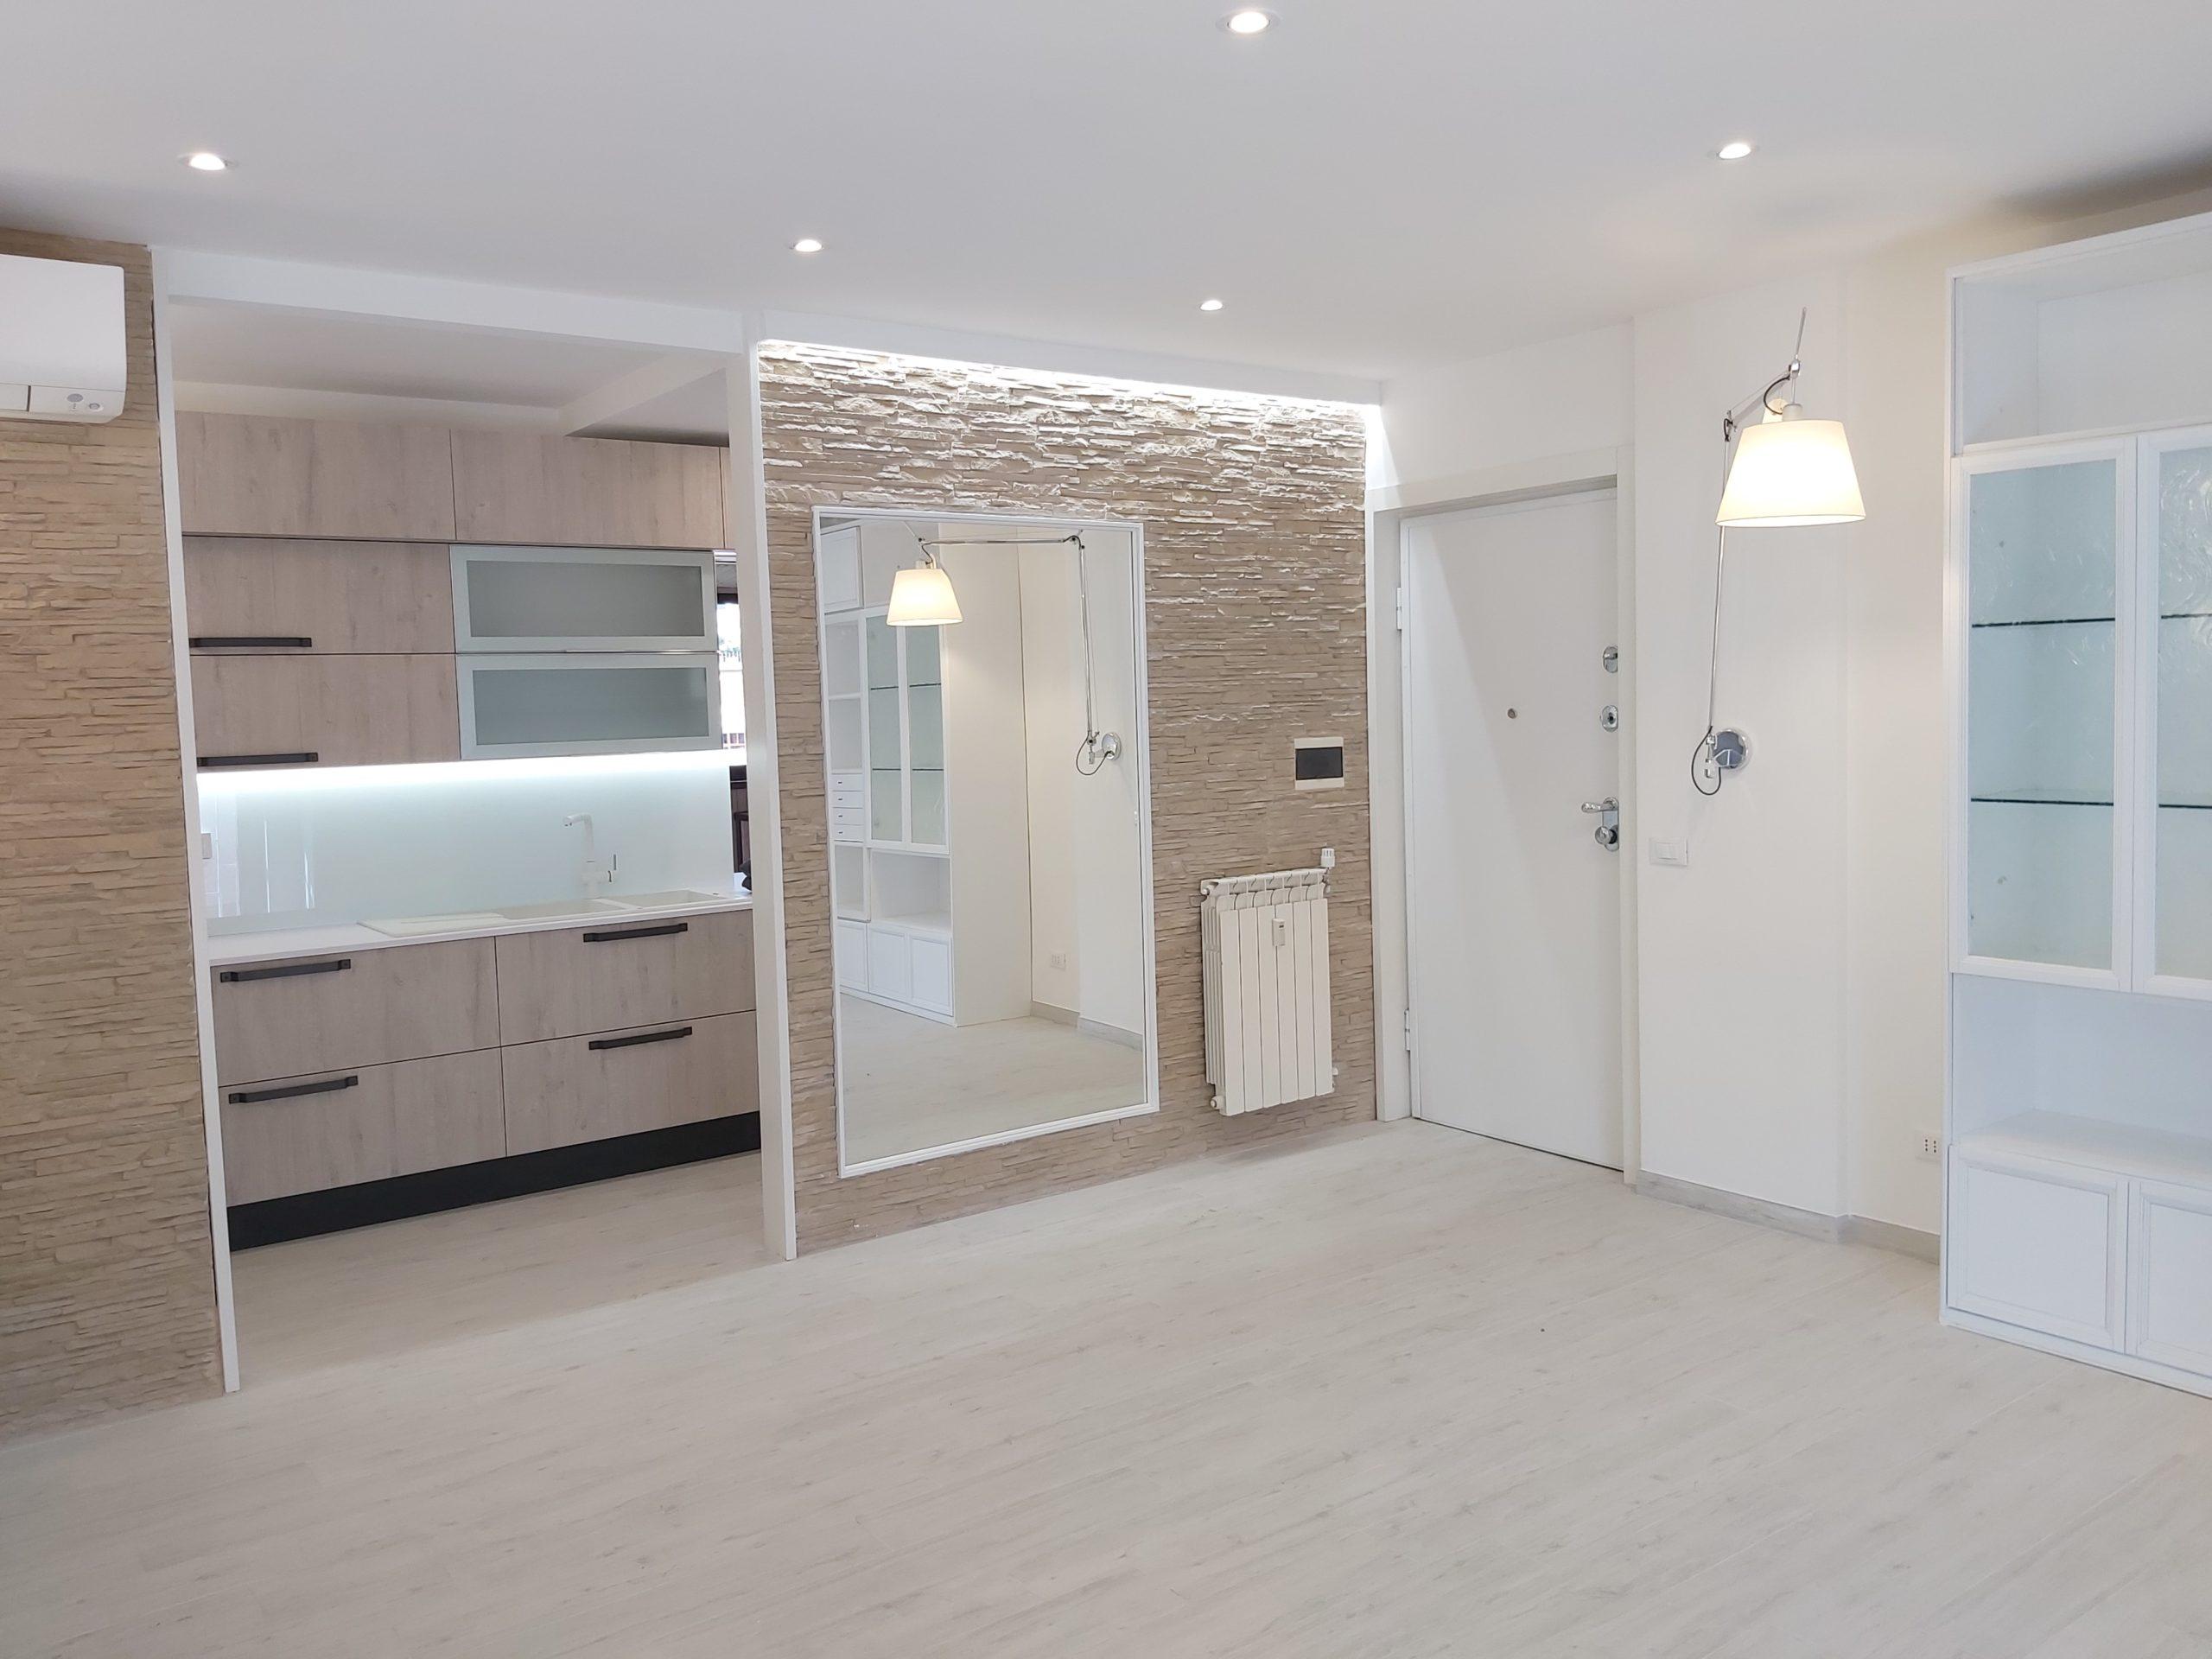 Ristrutturazione Completa Casa Costi ristrutturazioni roma a partire da 229,00€ al mq | sogek